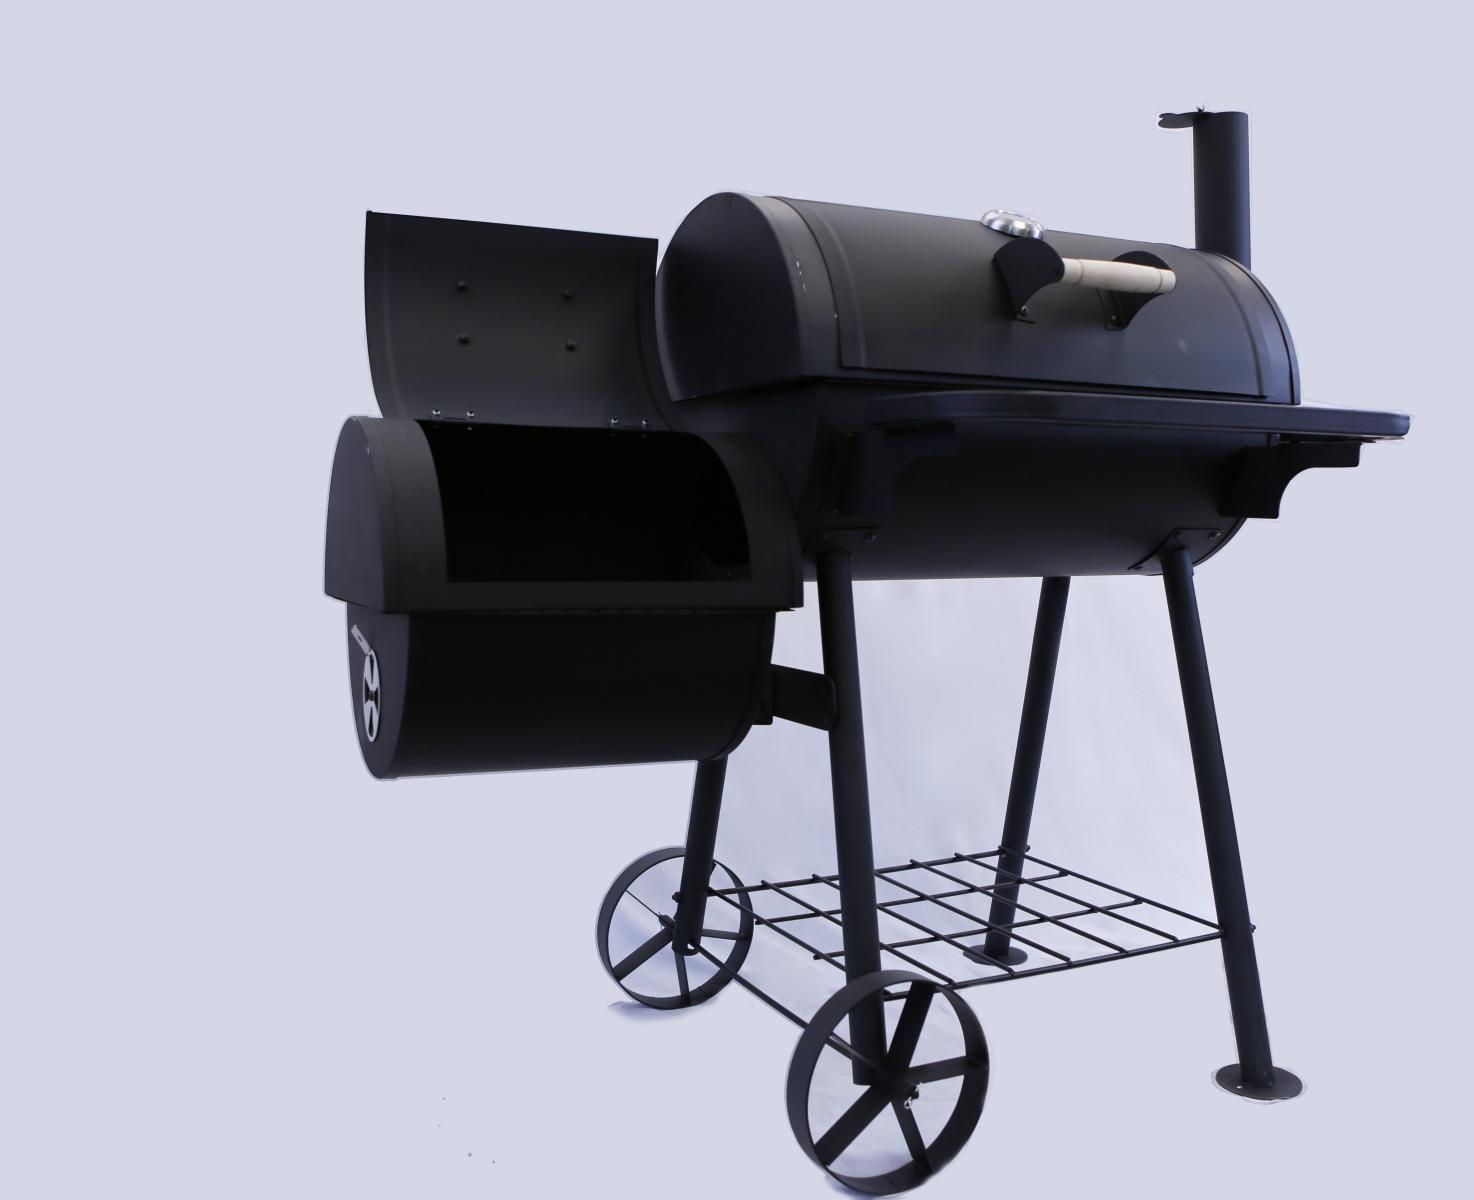 black superb bbq charcoal grill barbecue smoker garden outdoor cooking steel ebay. Black Bedroom Furniture Sets. Home Design Ideas